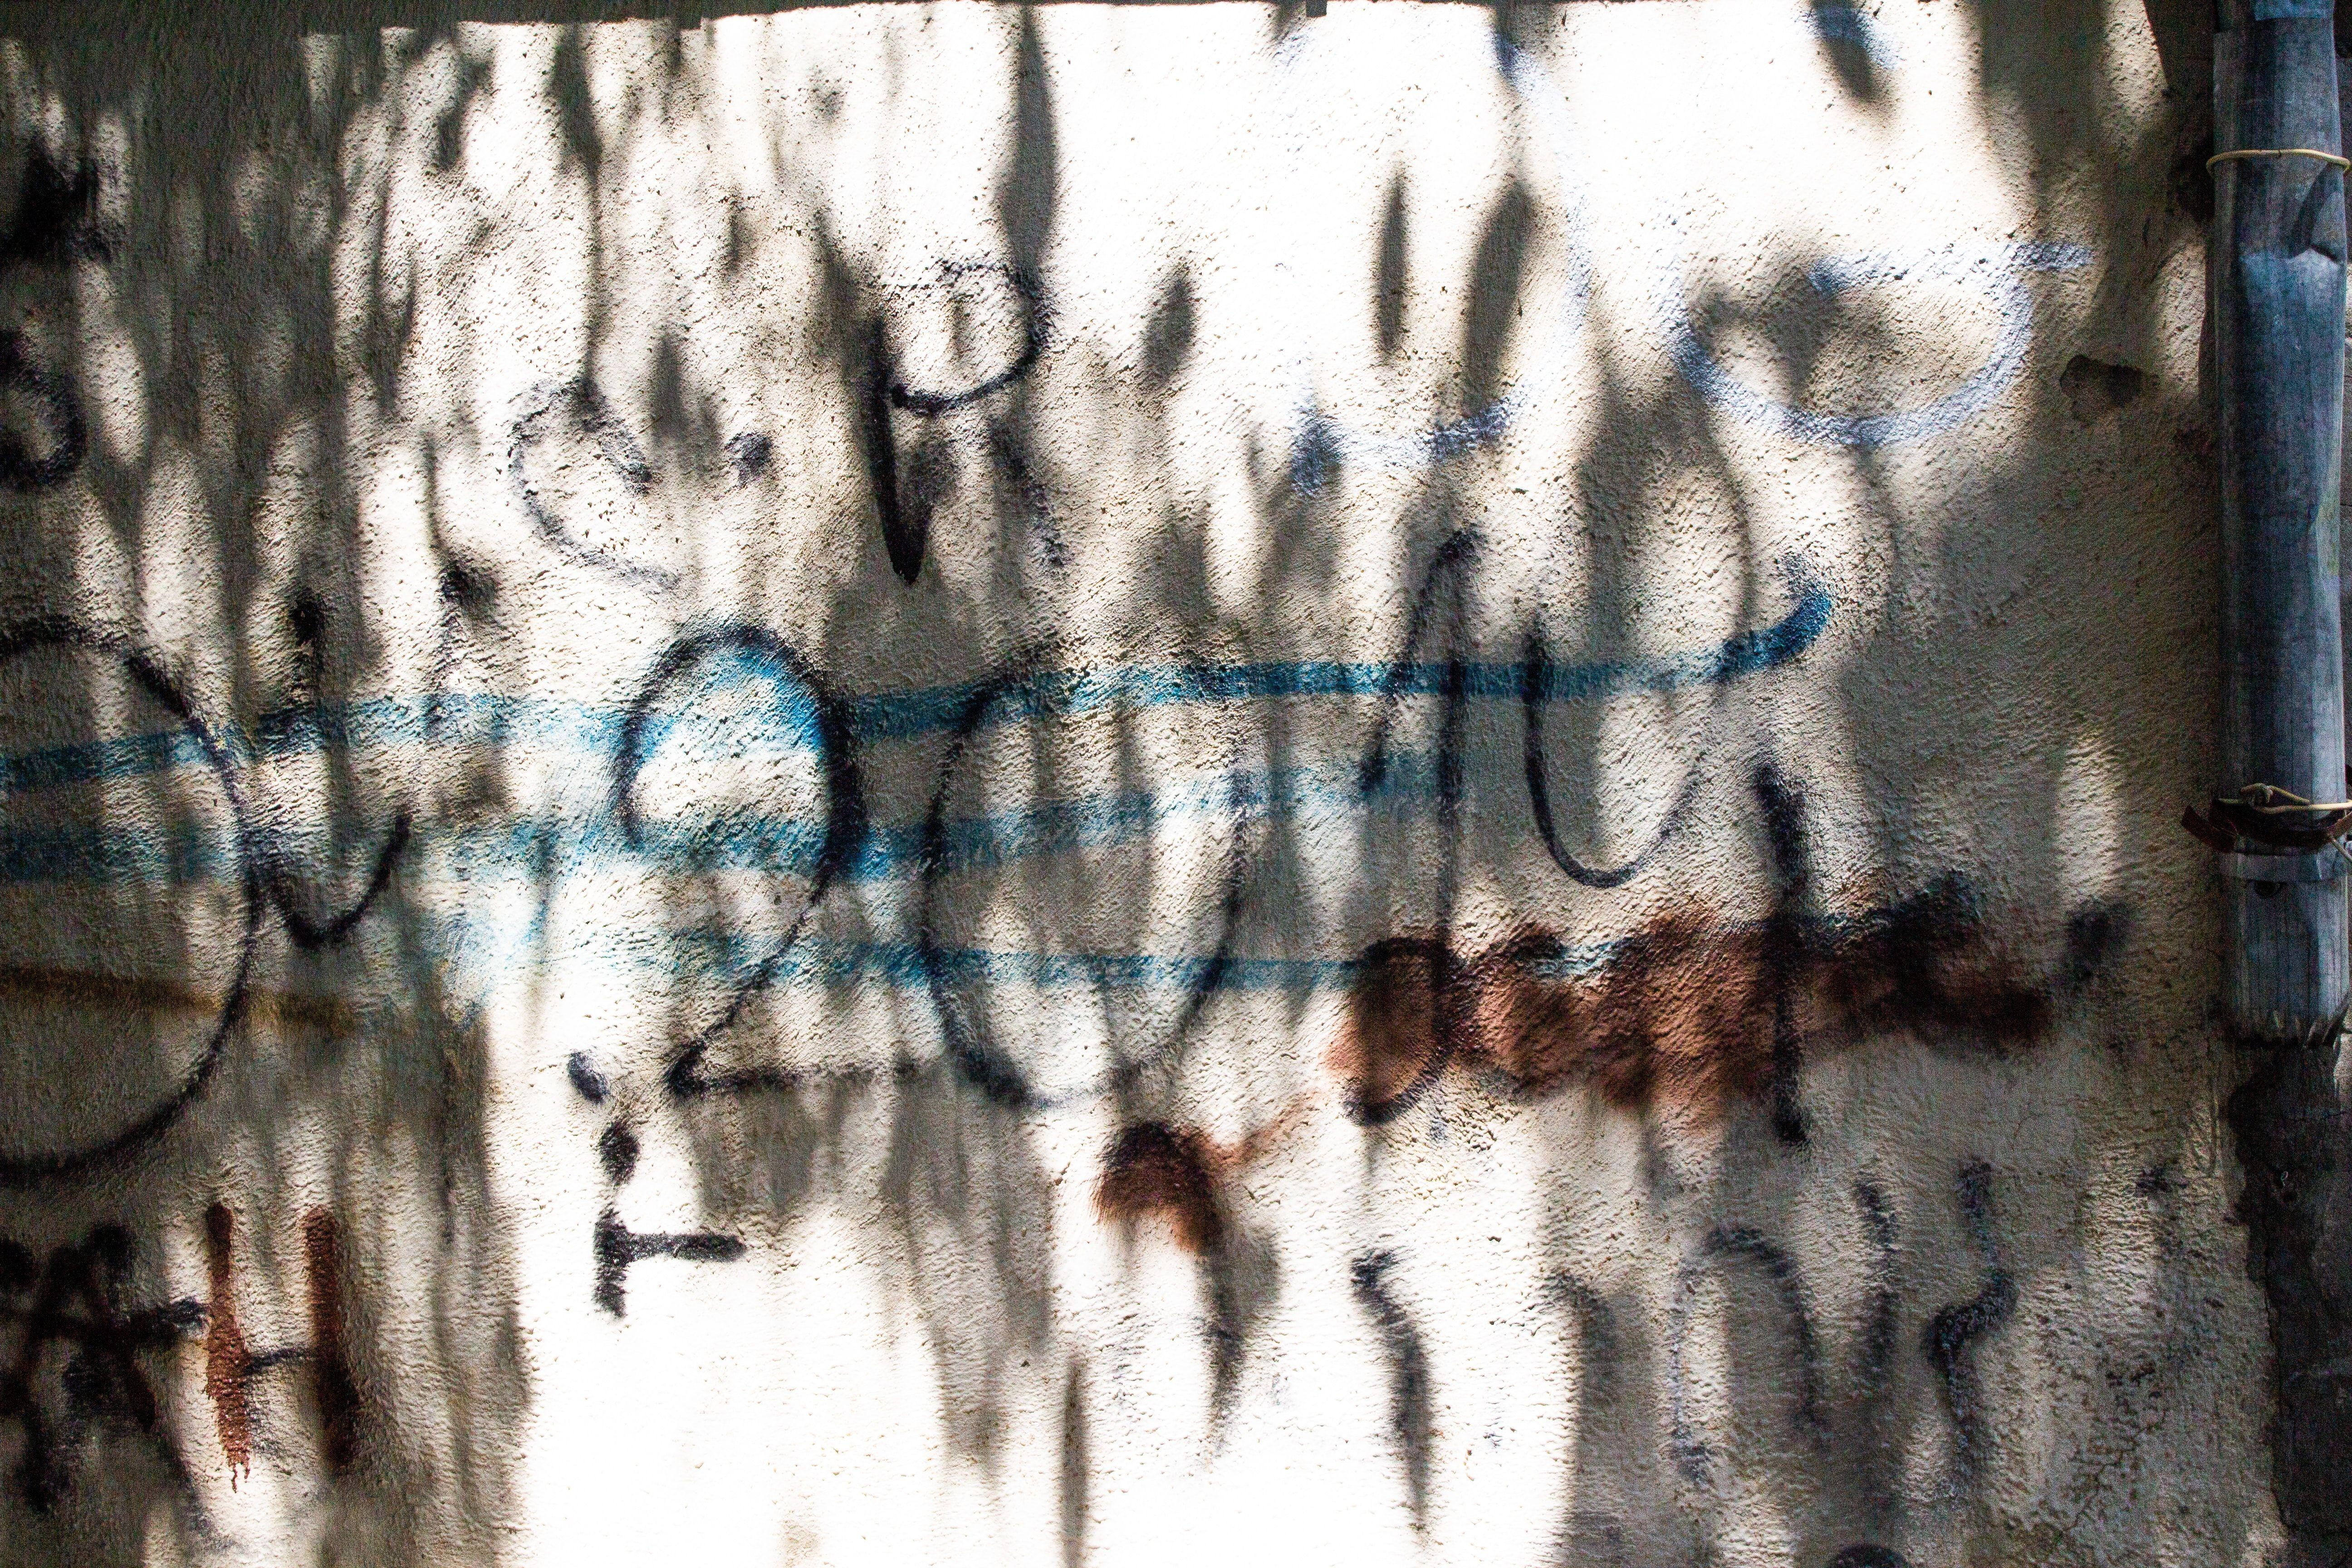 Text Graffiti Wall Gray Concrete Wall Gray Concrete Wall Cement Wall With Graffiti And Shadows Concrete Wall Cement Walls Concrete